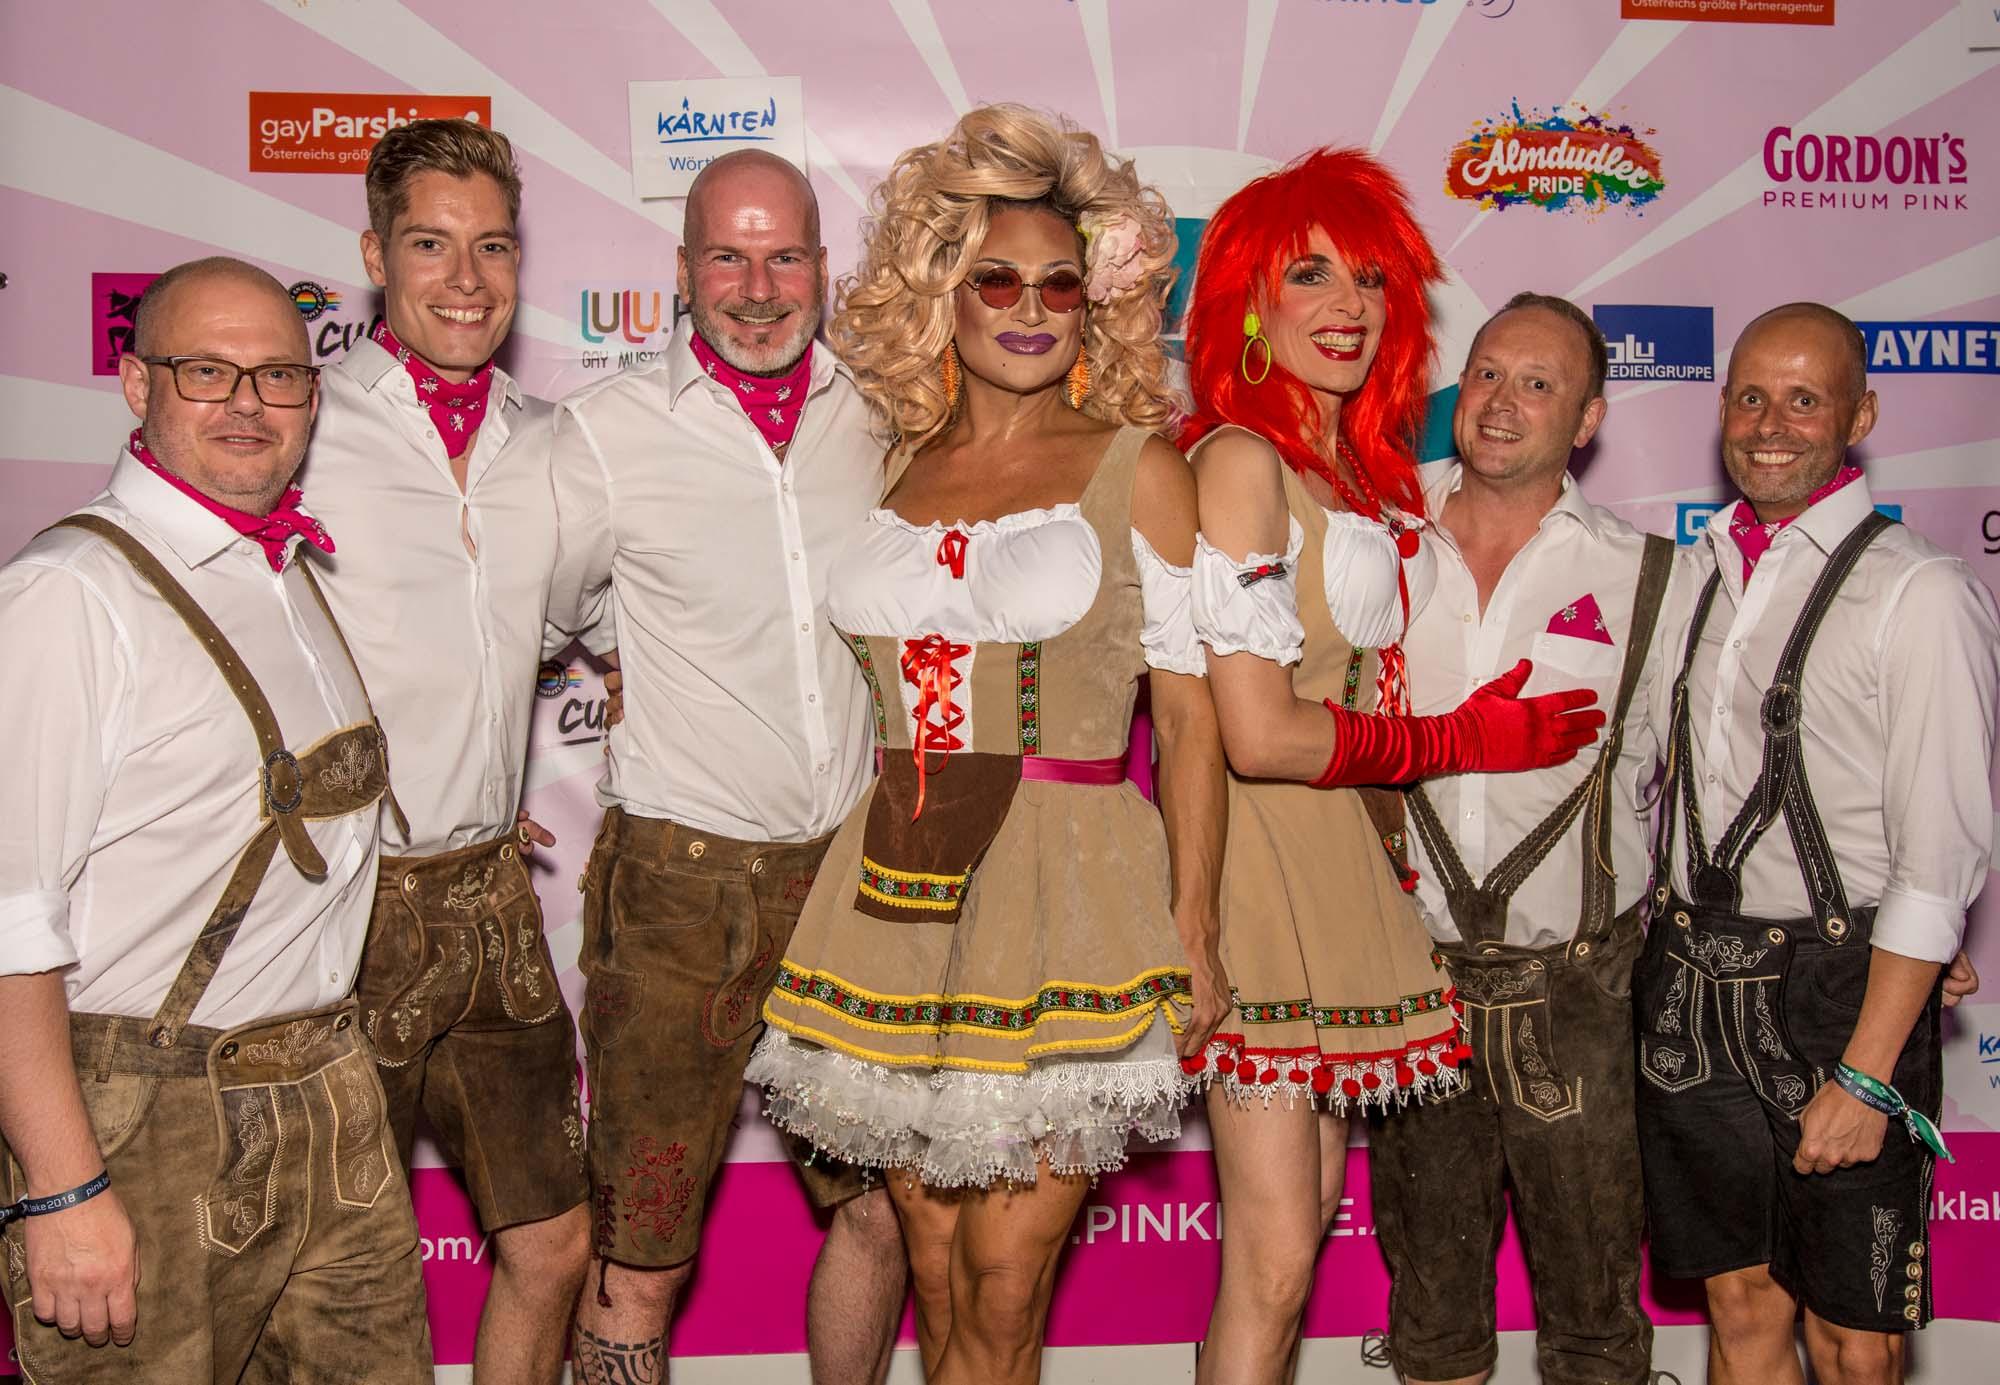 PINK LAKE FESTIVAL 2018